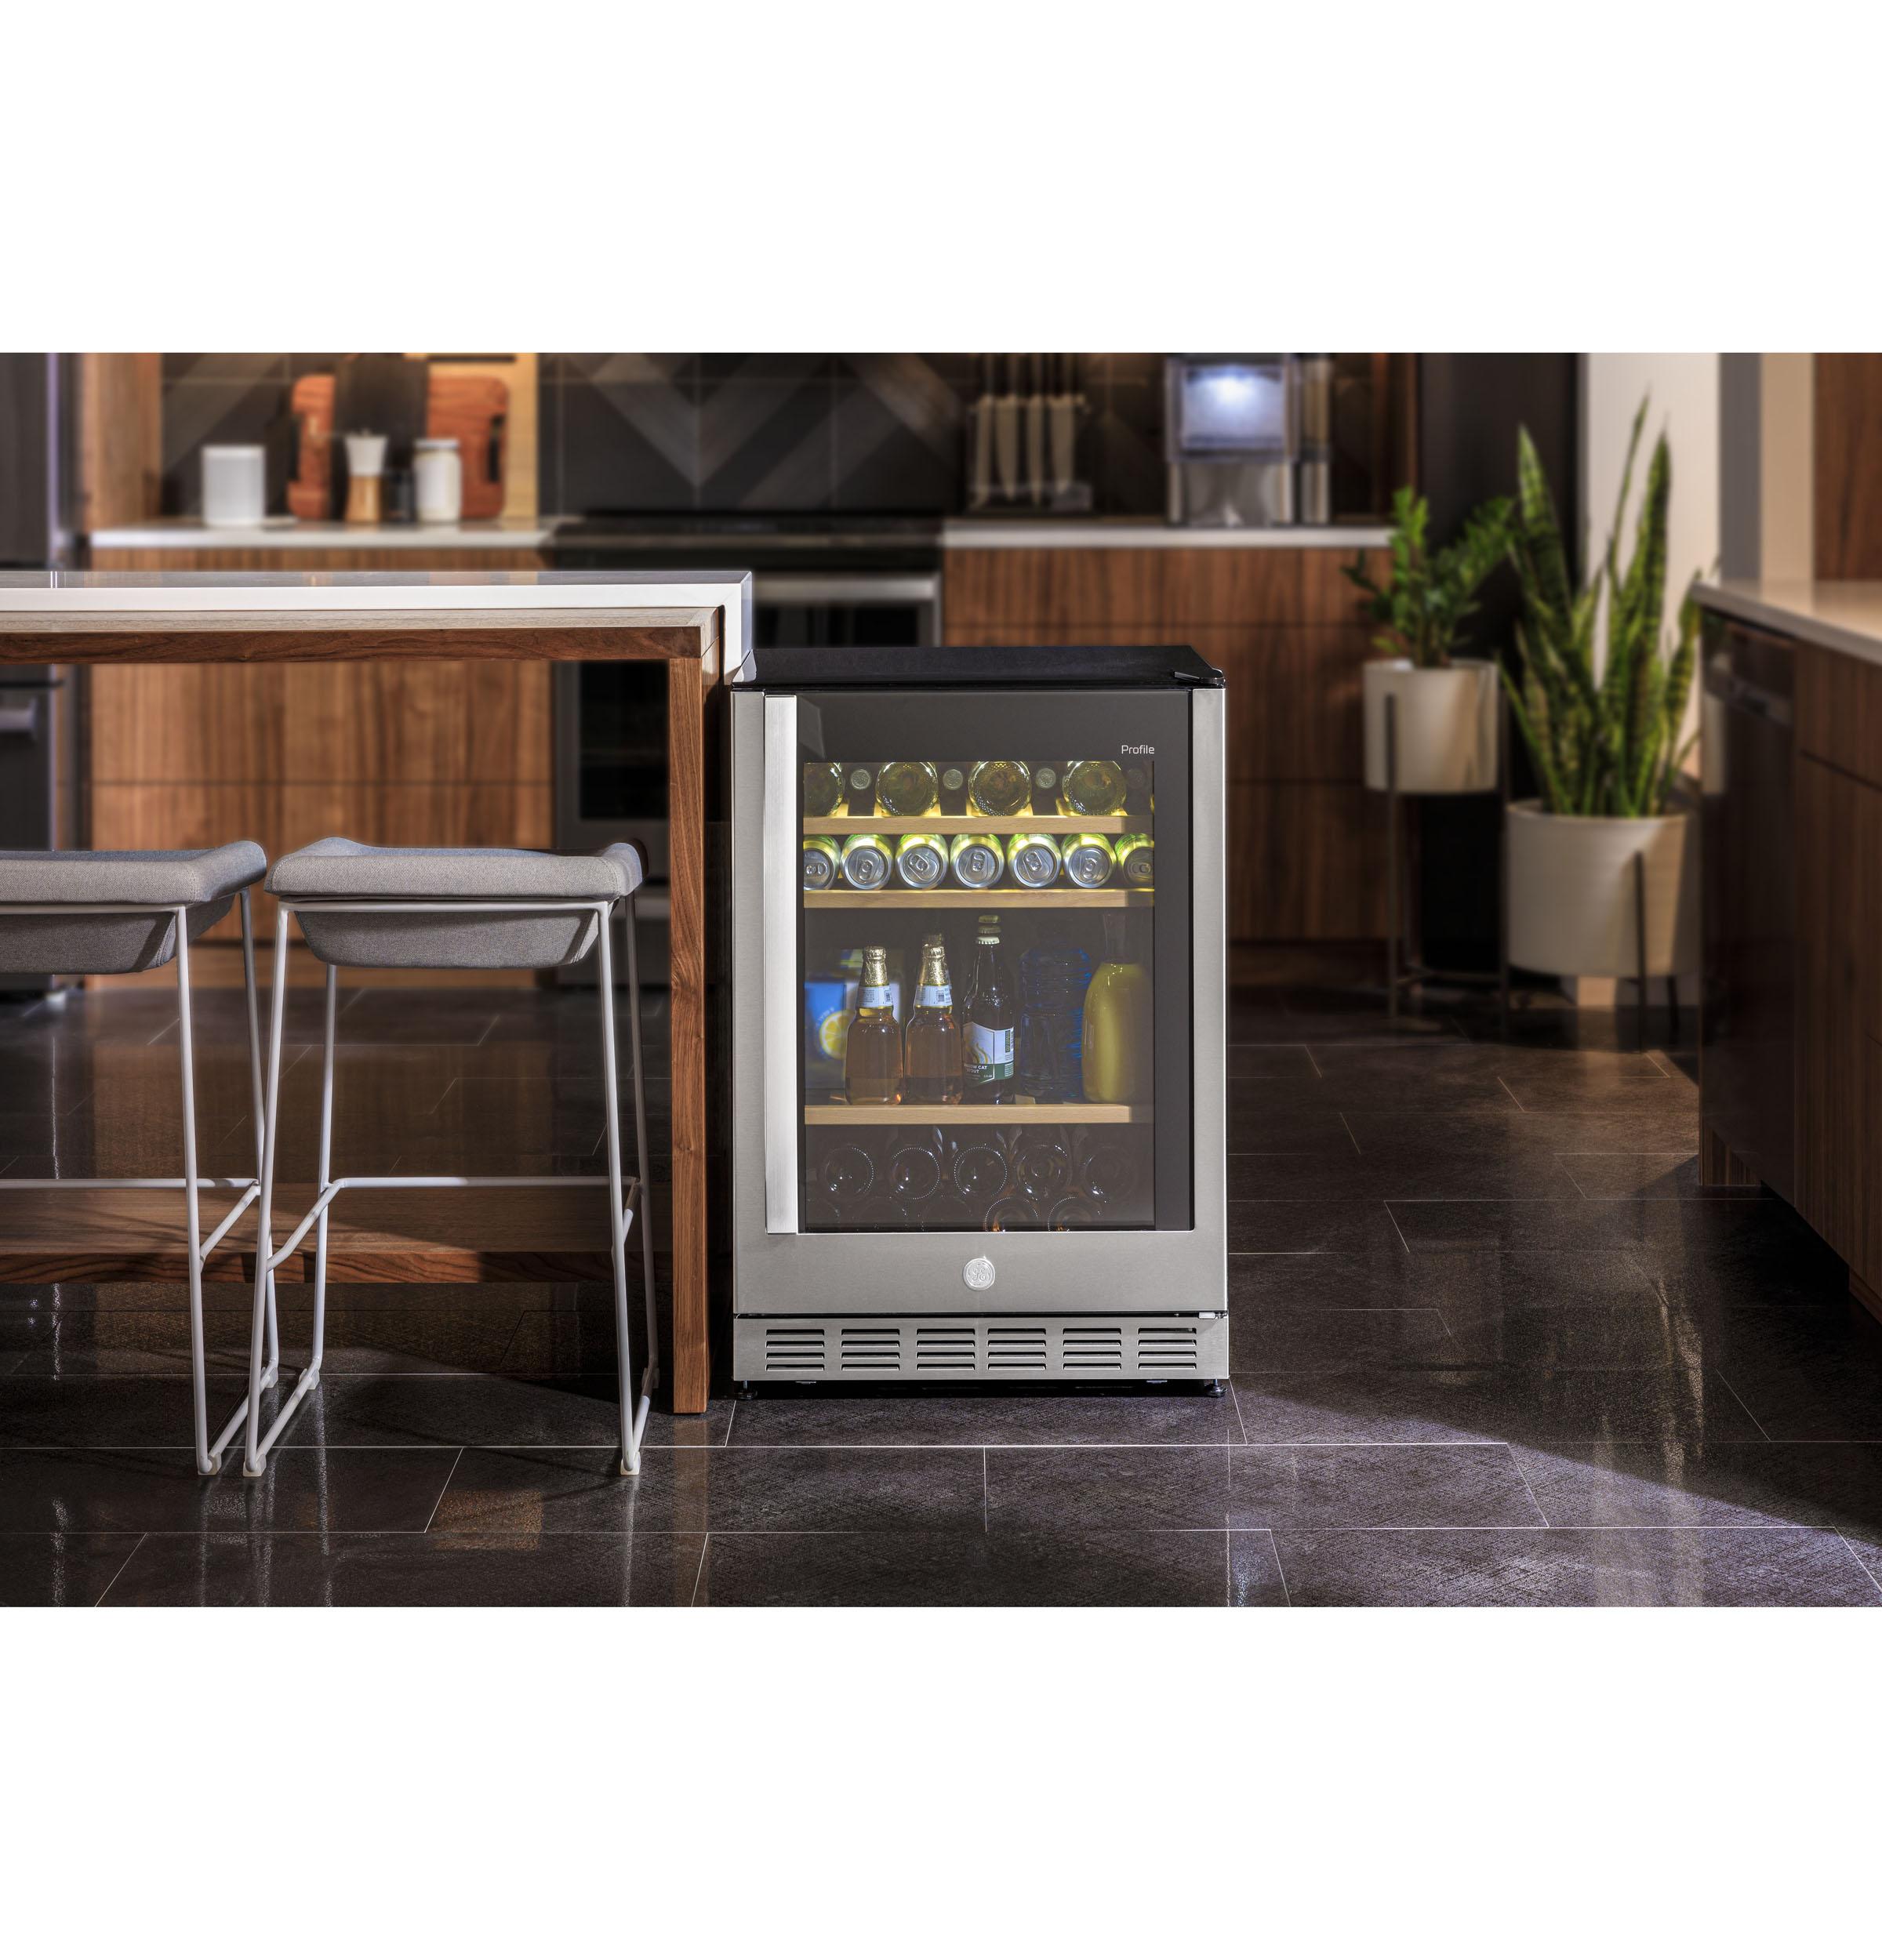 Model: PVS06BSPSS | GE Profile GE Profile™ Series Beverage Center